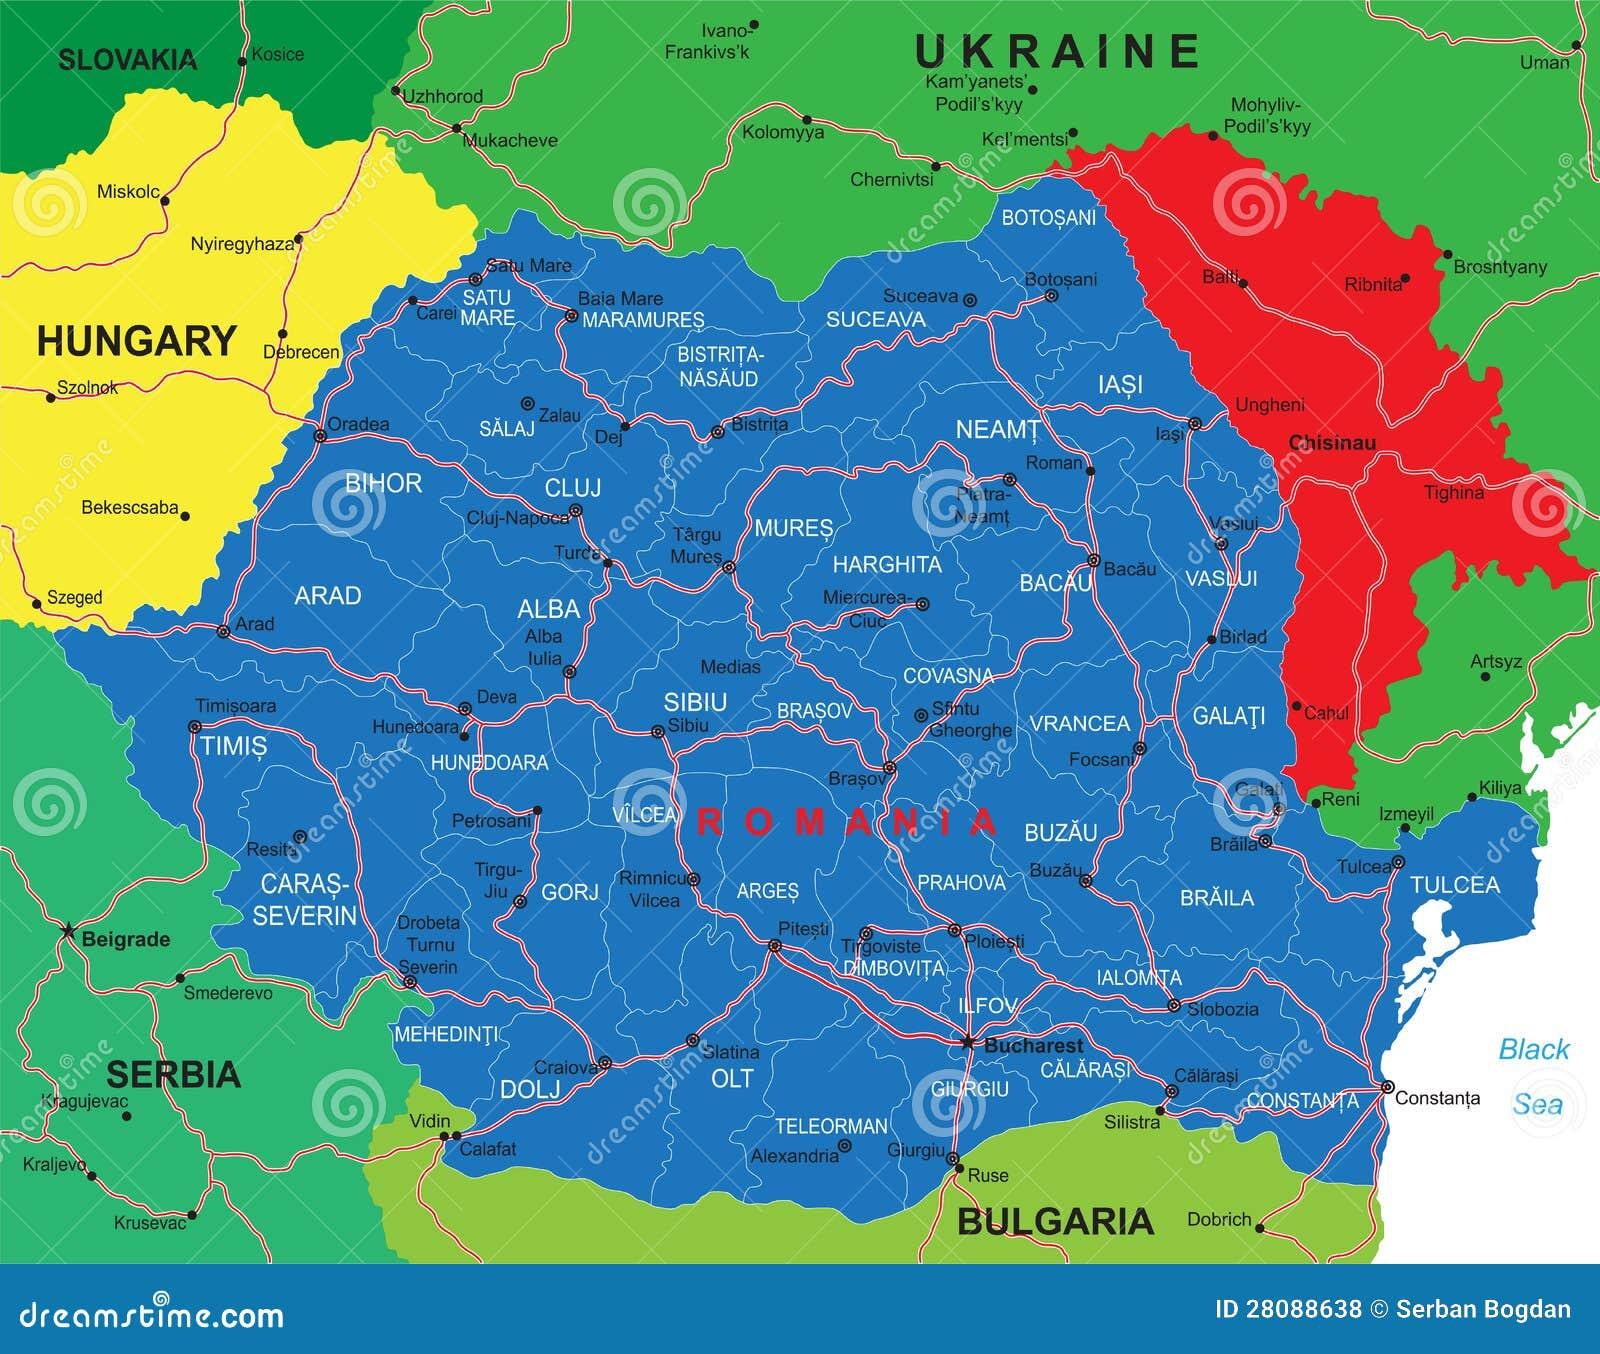 Romania Brasov map stock image Image of journey place 17532157